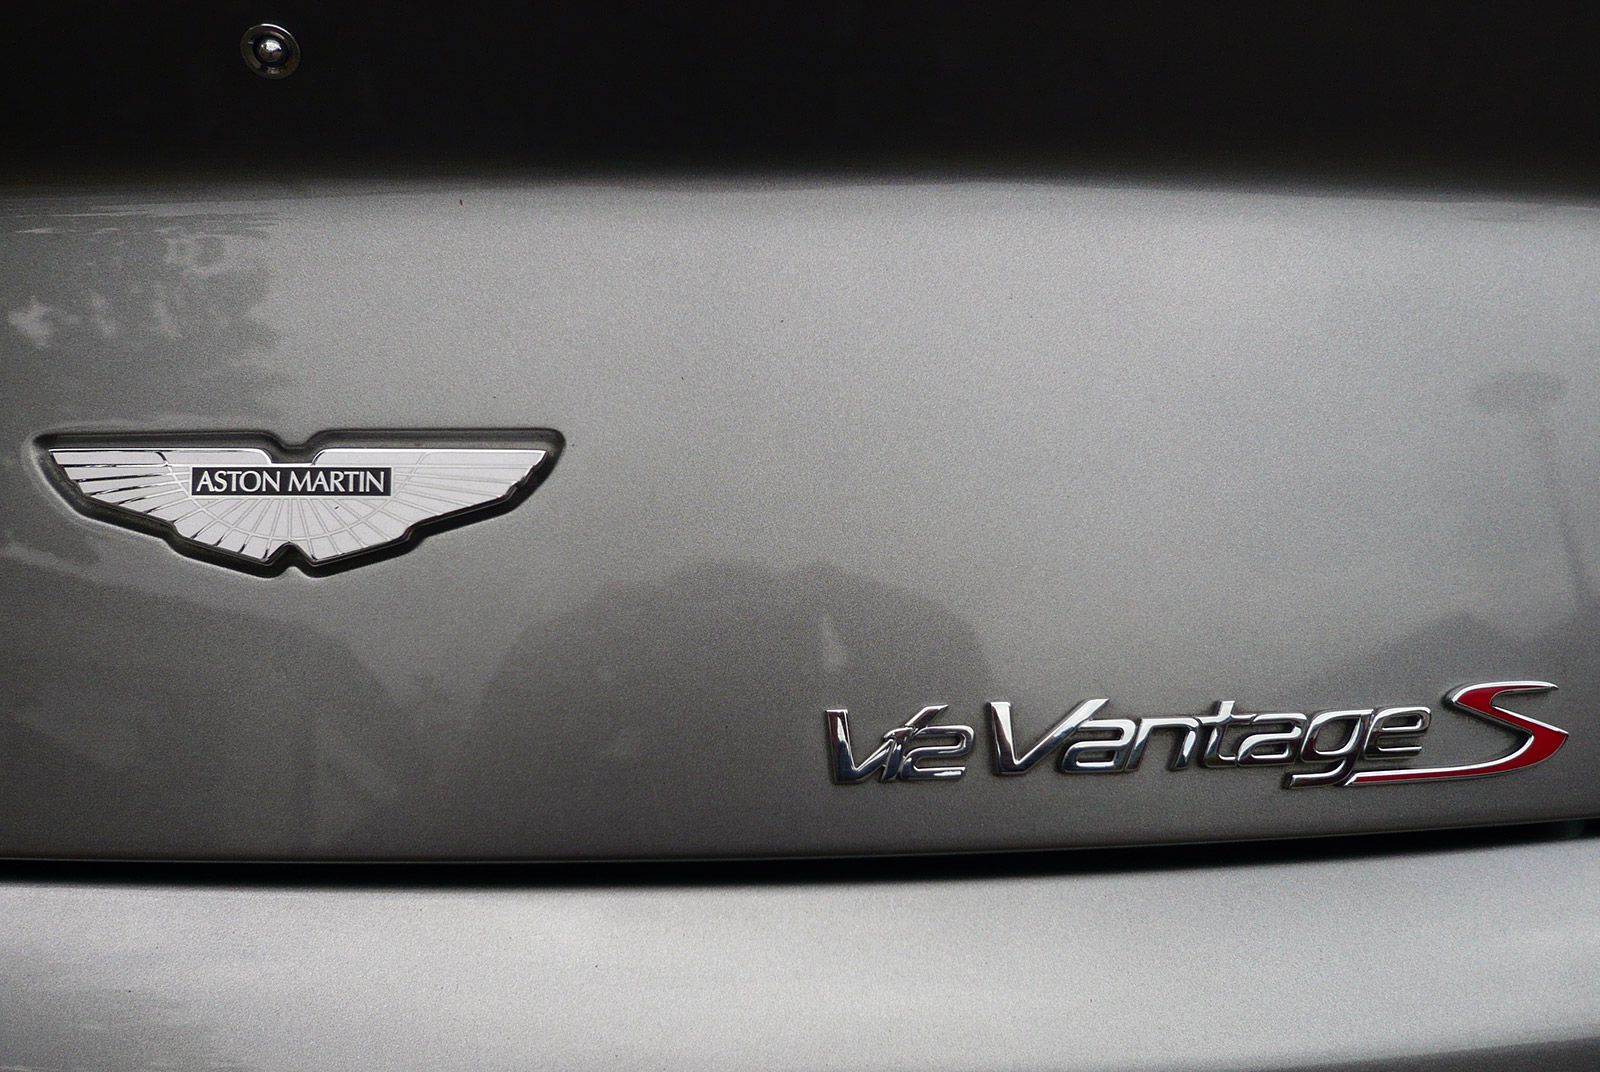 AM-2995-Aston-Martin_V12-Vantage-S_Grau_Schwarz_15